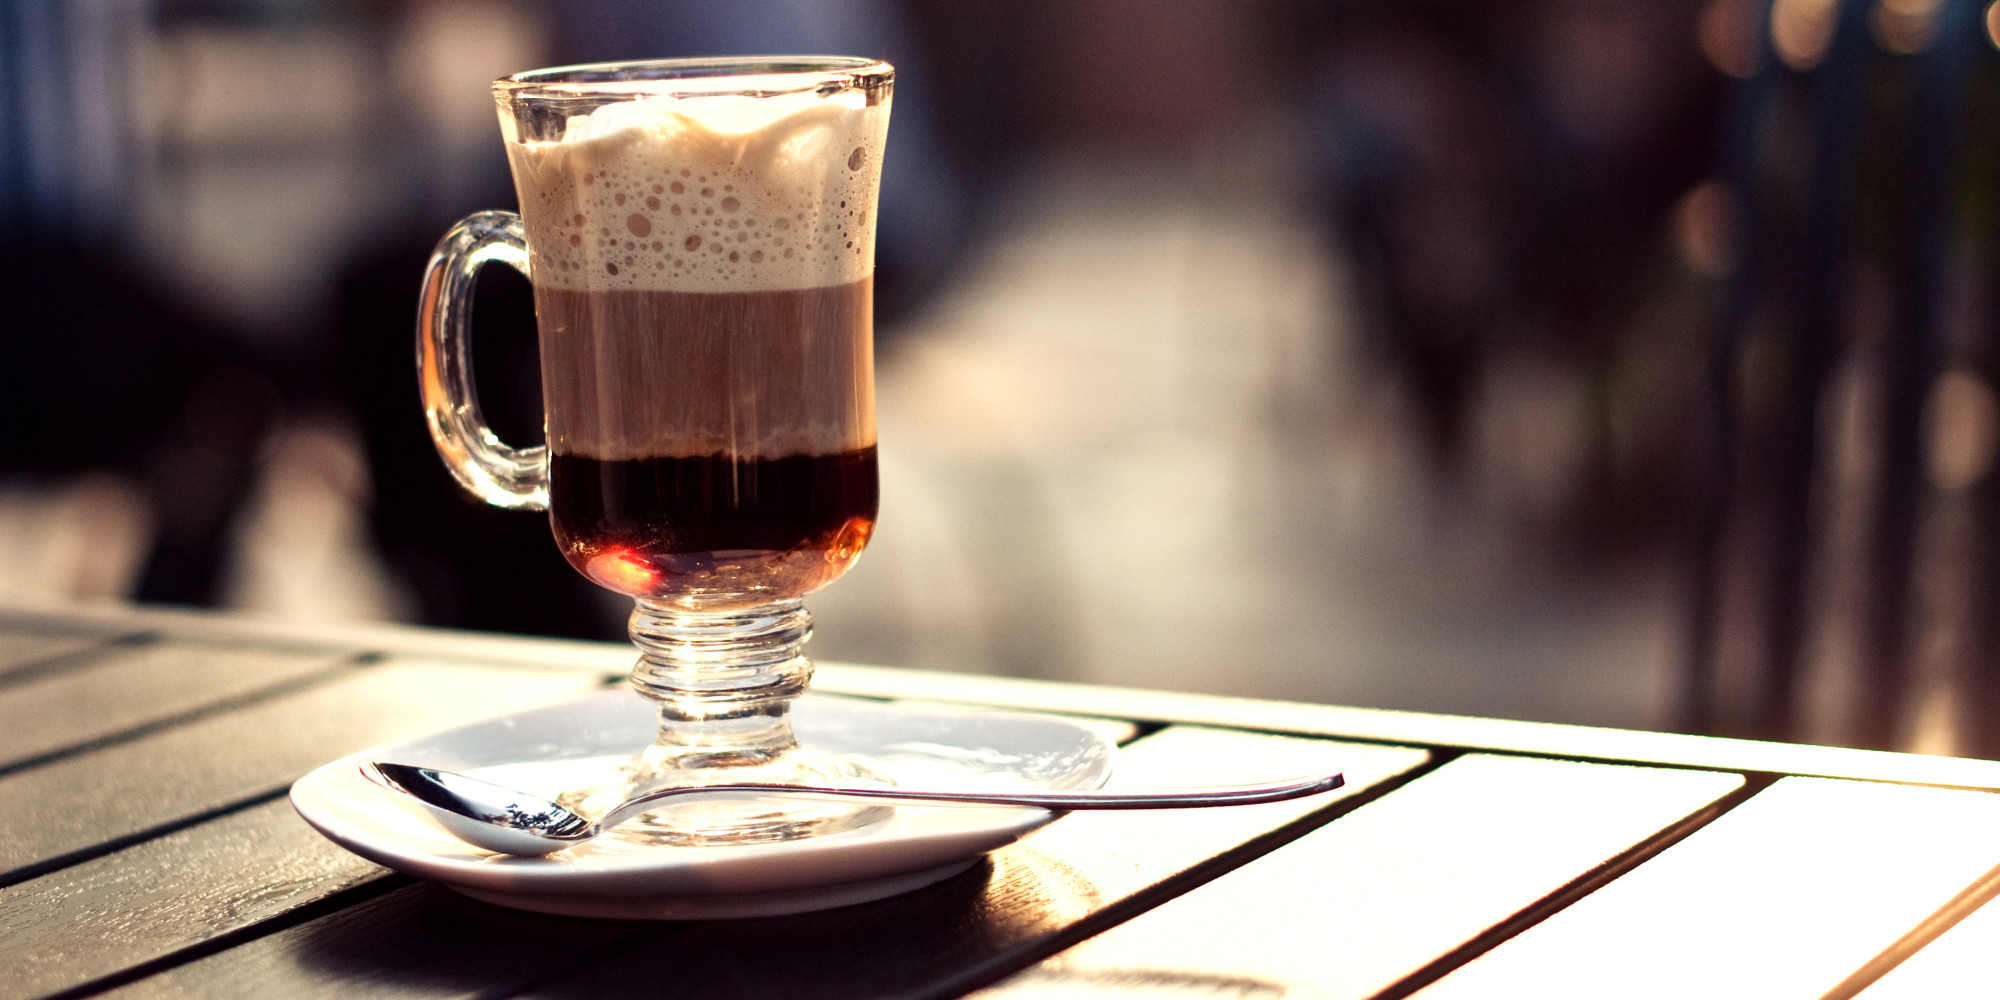 IRISH-COFFEE-COCKTAIL-facebook.jpg